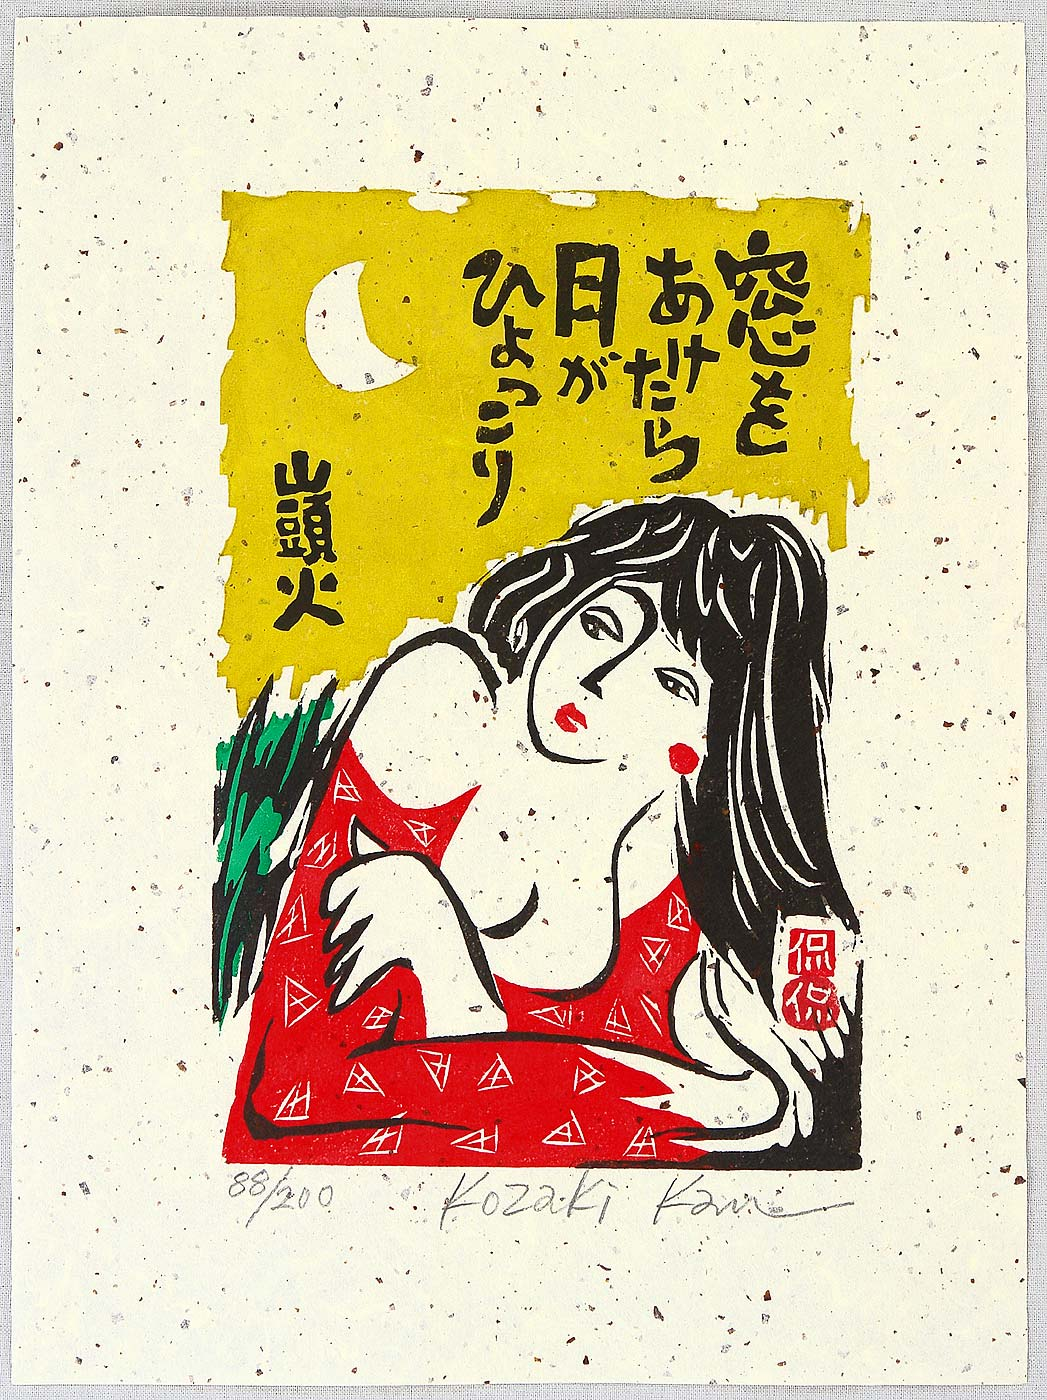 kozaki kan when i opened a window artelino 浮世絵検索